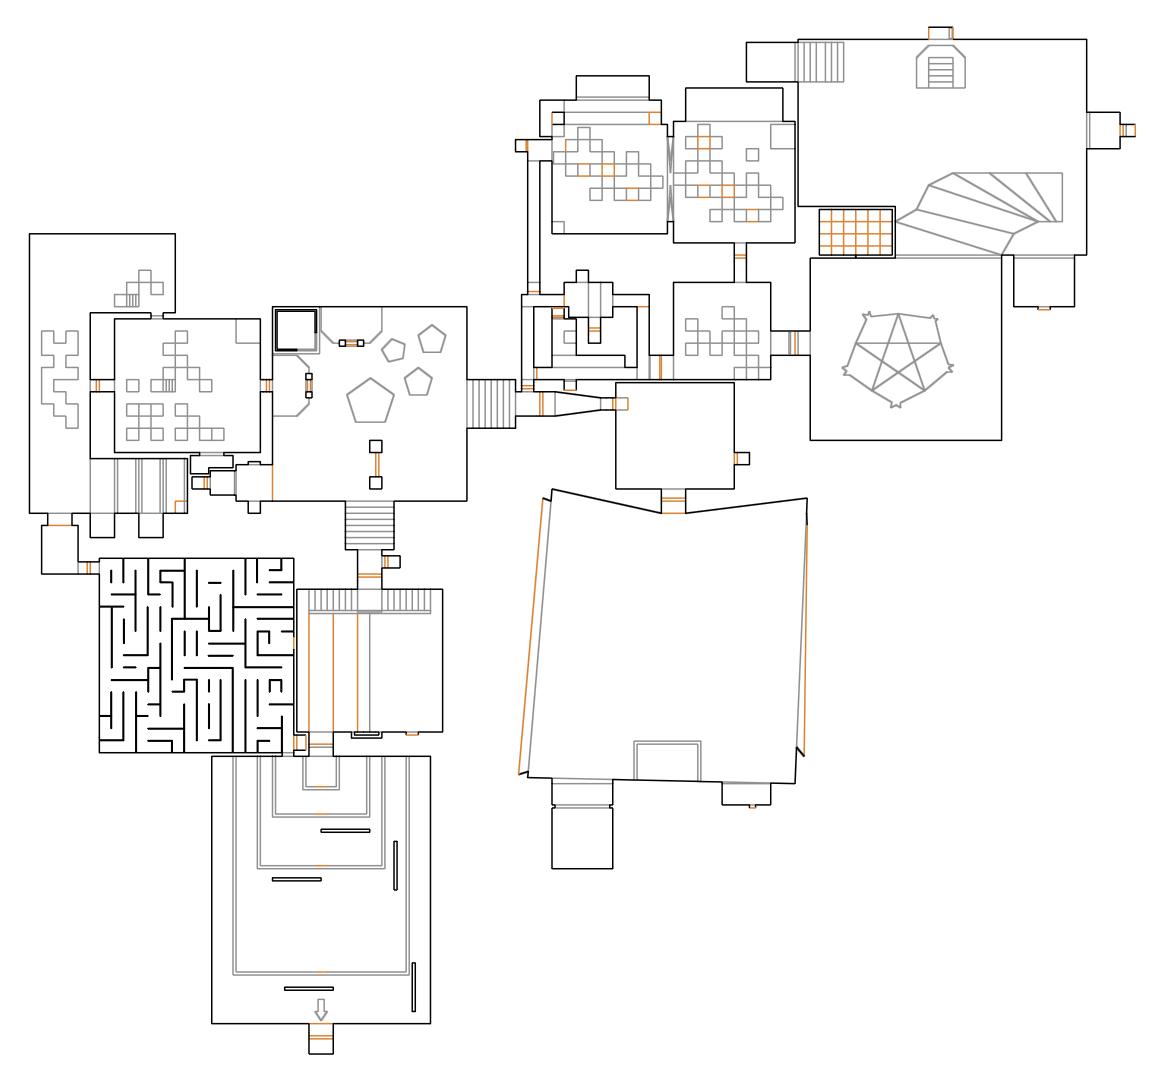 MAP01.wad_MAP11.png.df06b56f3661c204d45d5b2a10a41e94.png